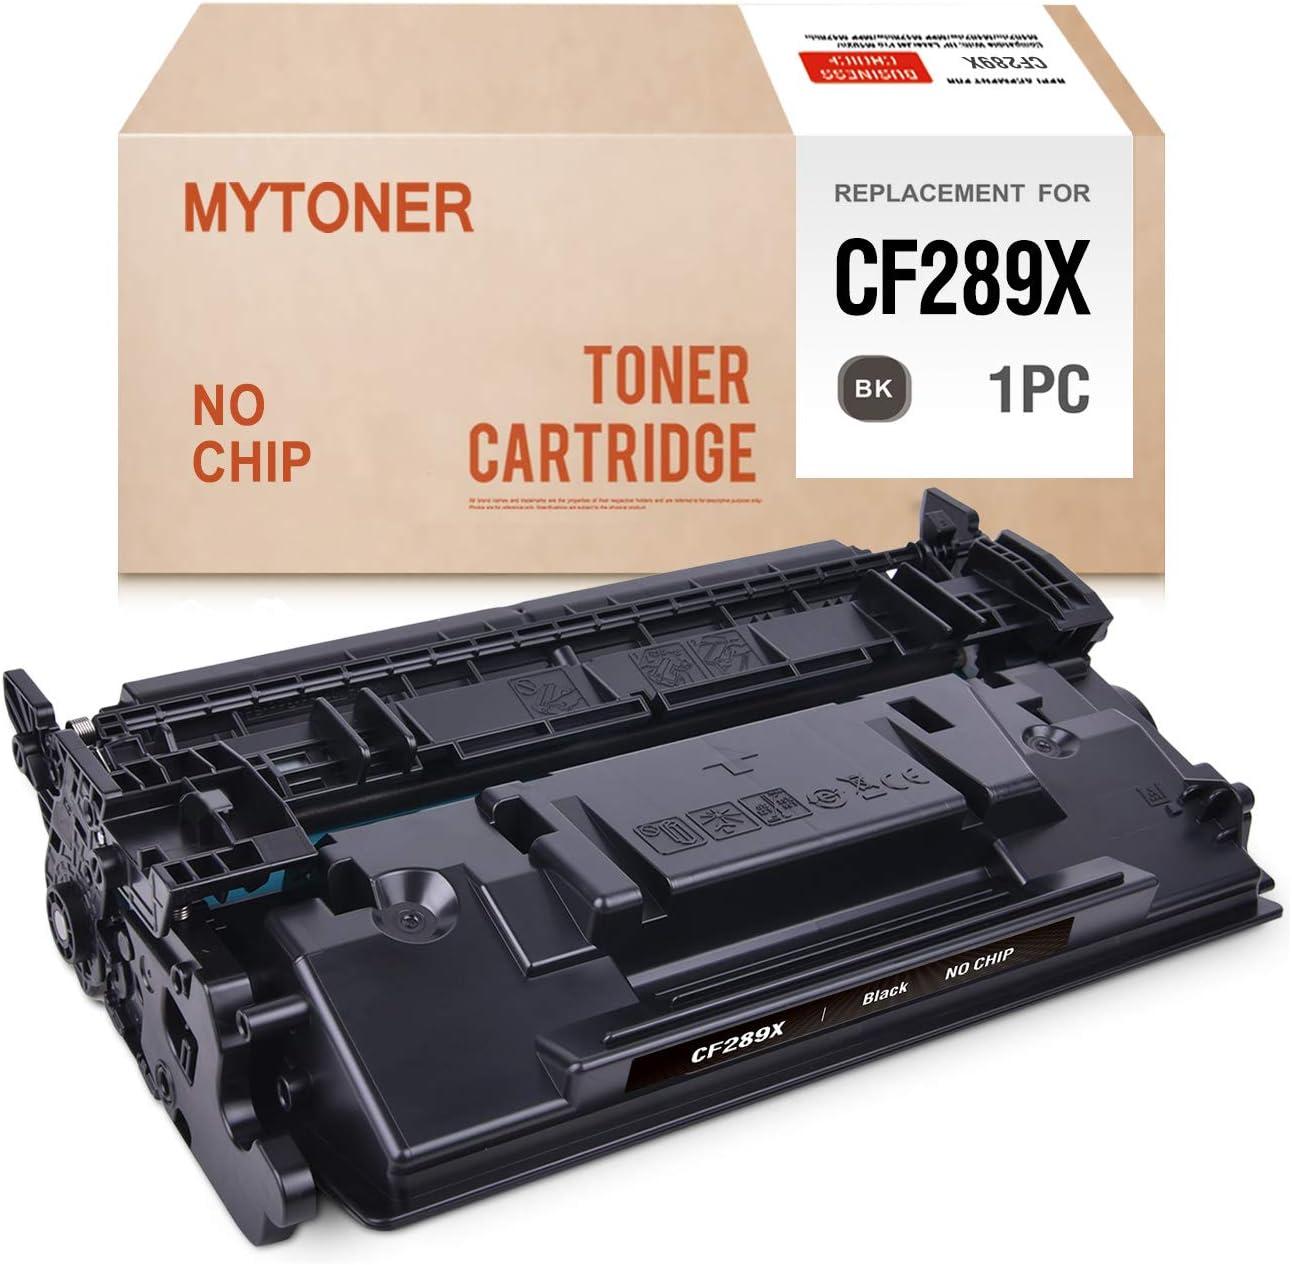 MYTONER (No Chip) Compatible Toner Cartridge Replacement for HP 89X CF289X High Yield Toner for Laserjet Enterprise M507 MFP M528 Series Printer Ink (Black,1-Pack)